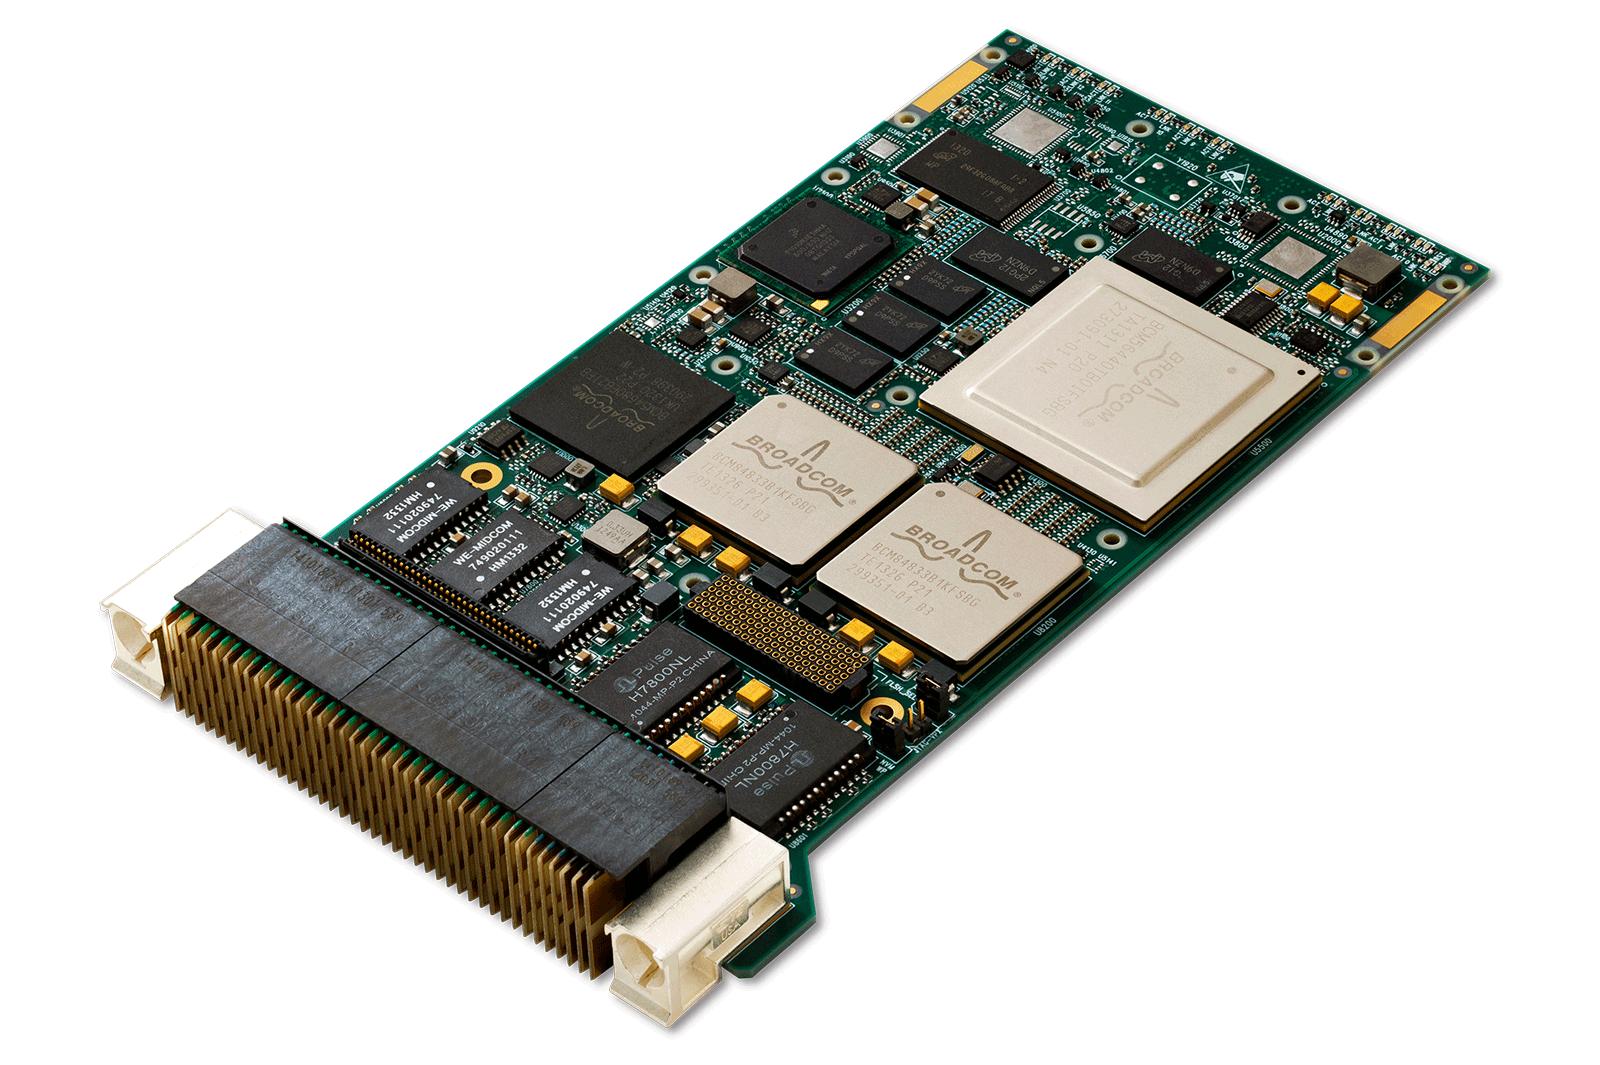 XChange3018 | 3U VPX 10 Gigabit Ethernet Embedded Switch